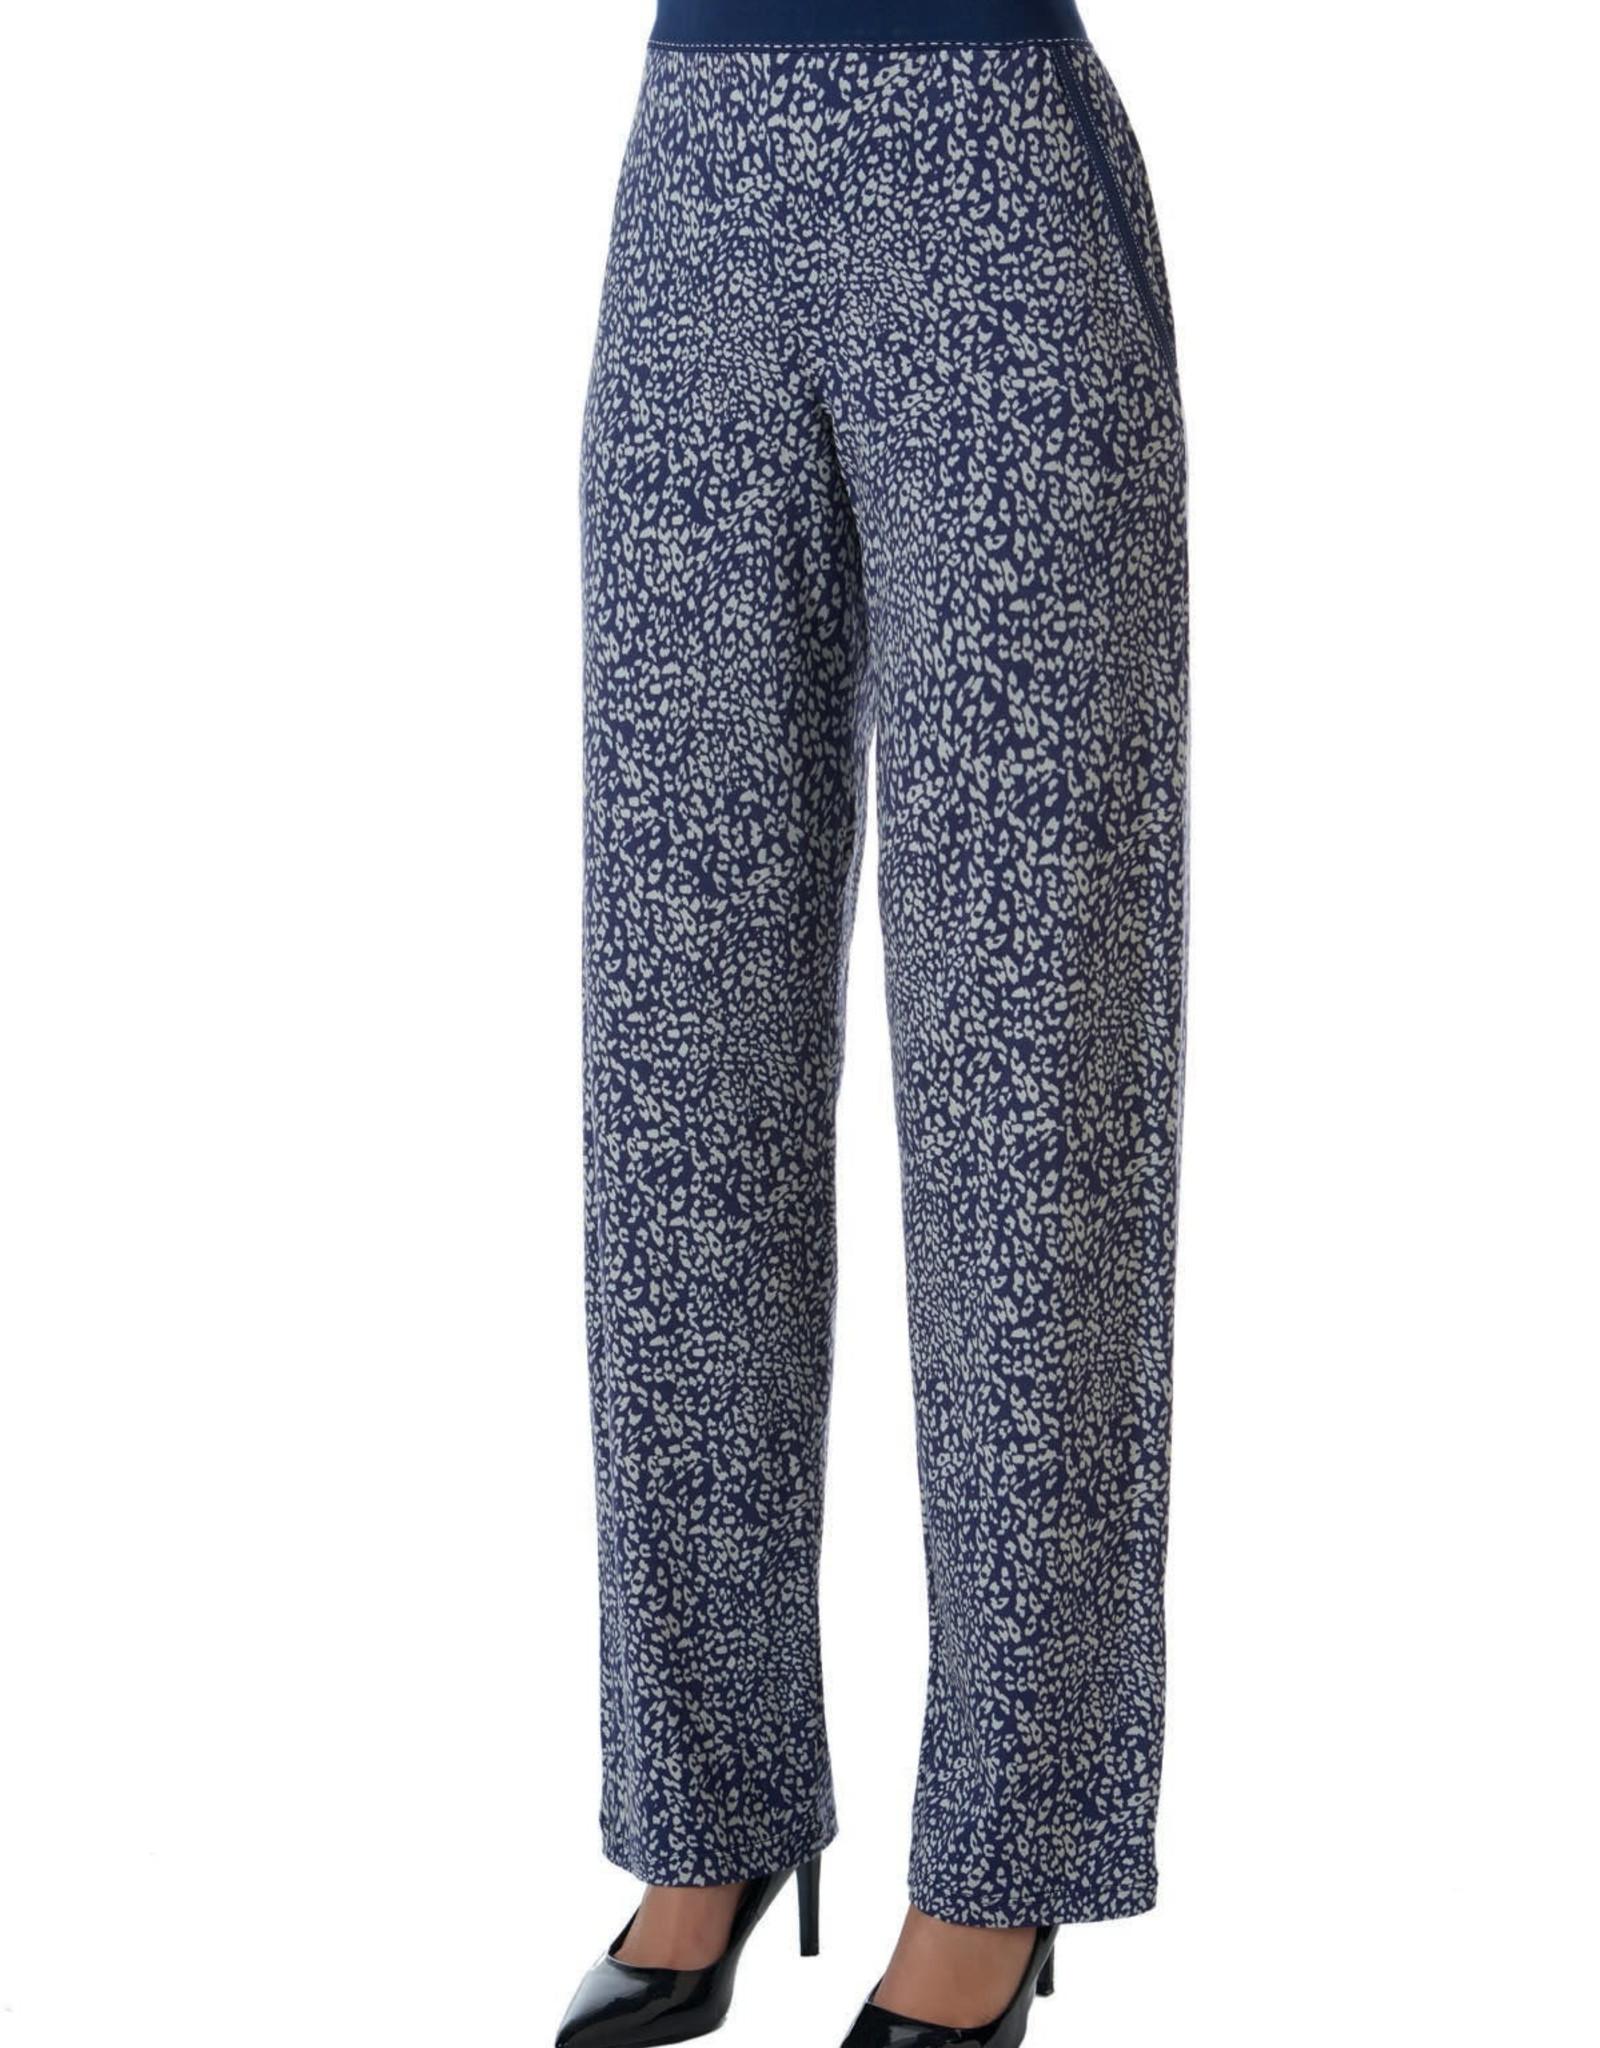 Janira Pantalon Loo Bleu Chat Janira avec Poches en Viscose LG25164